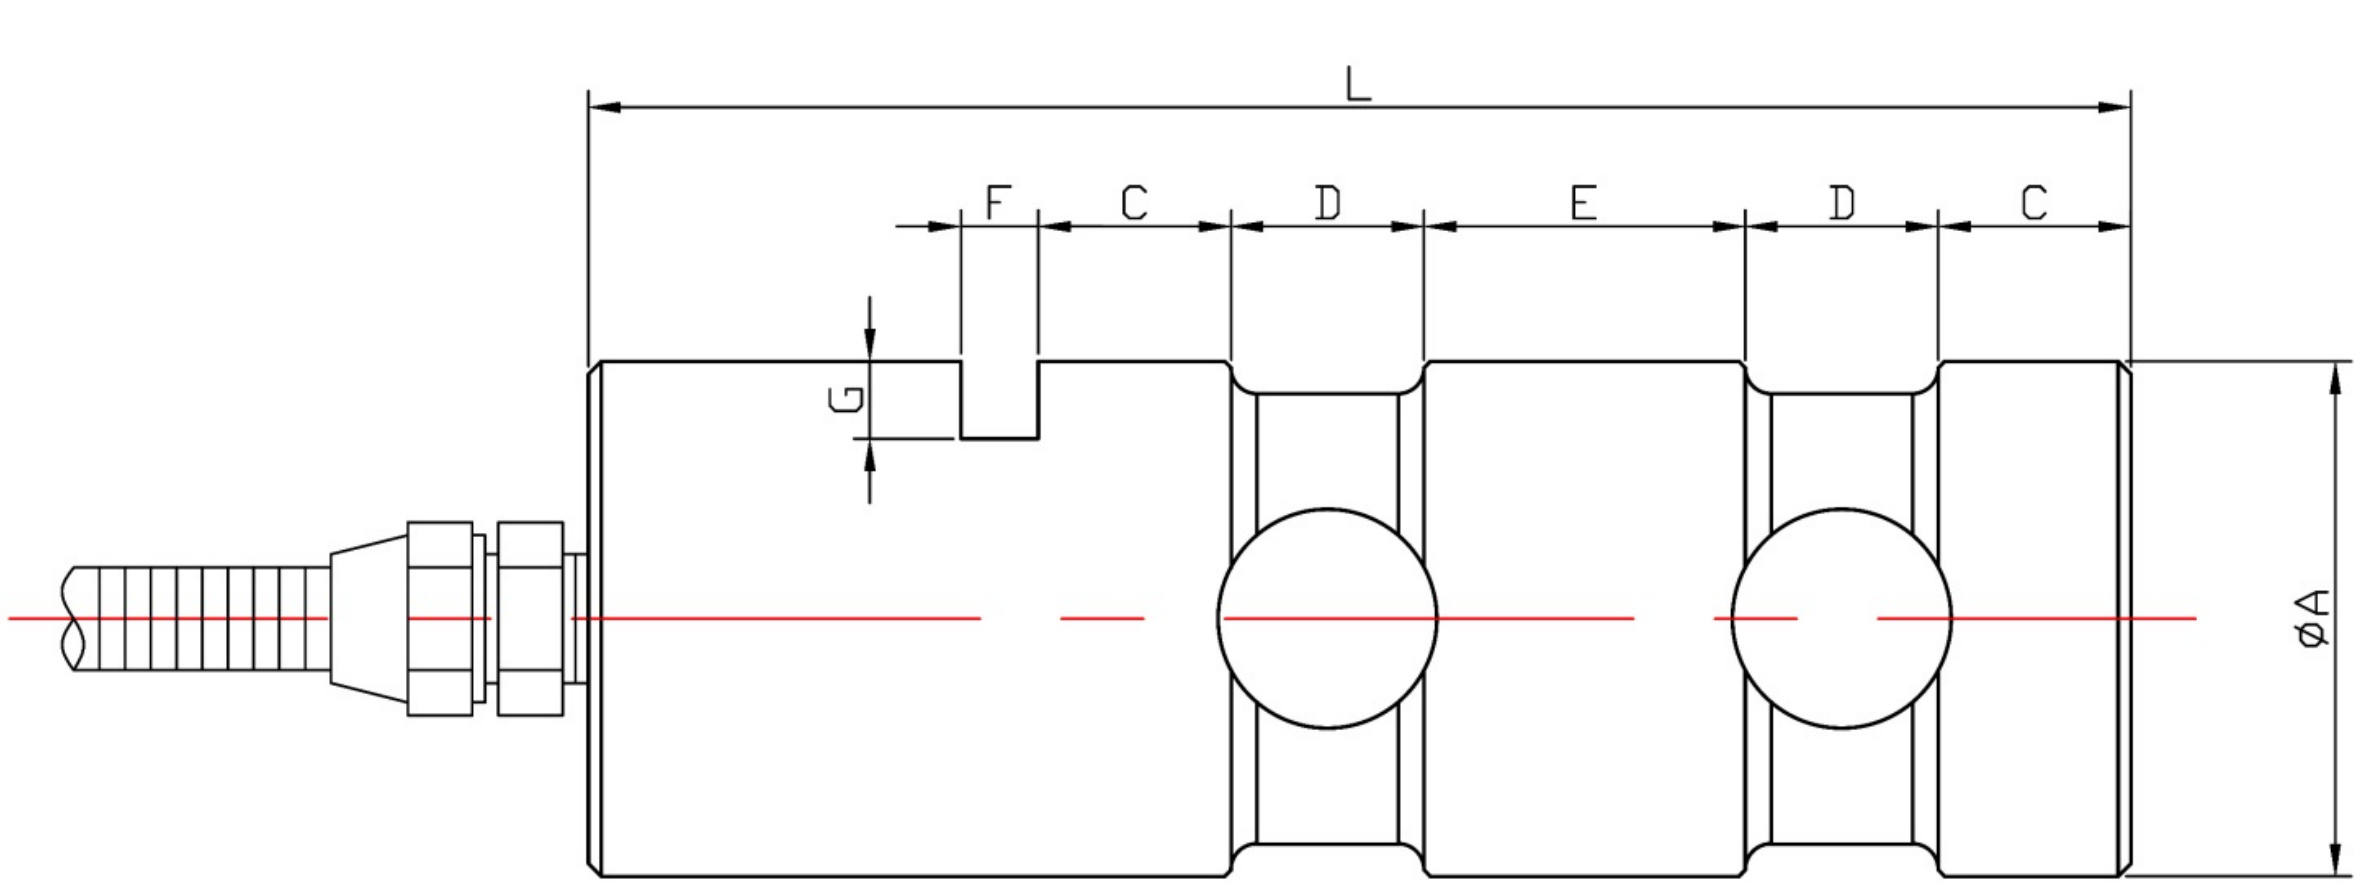 LLZX尺寸图